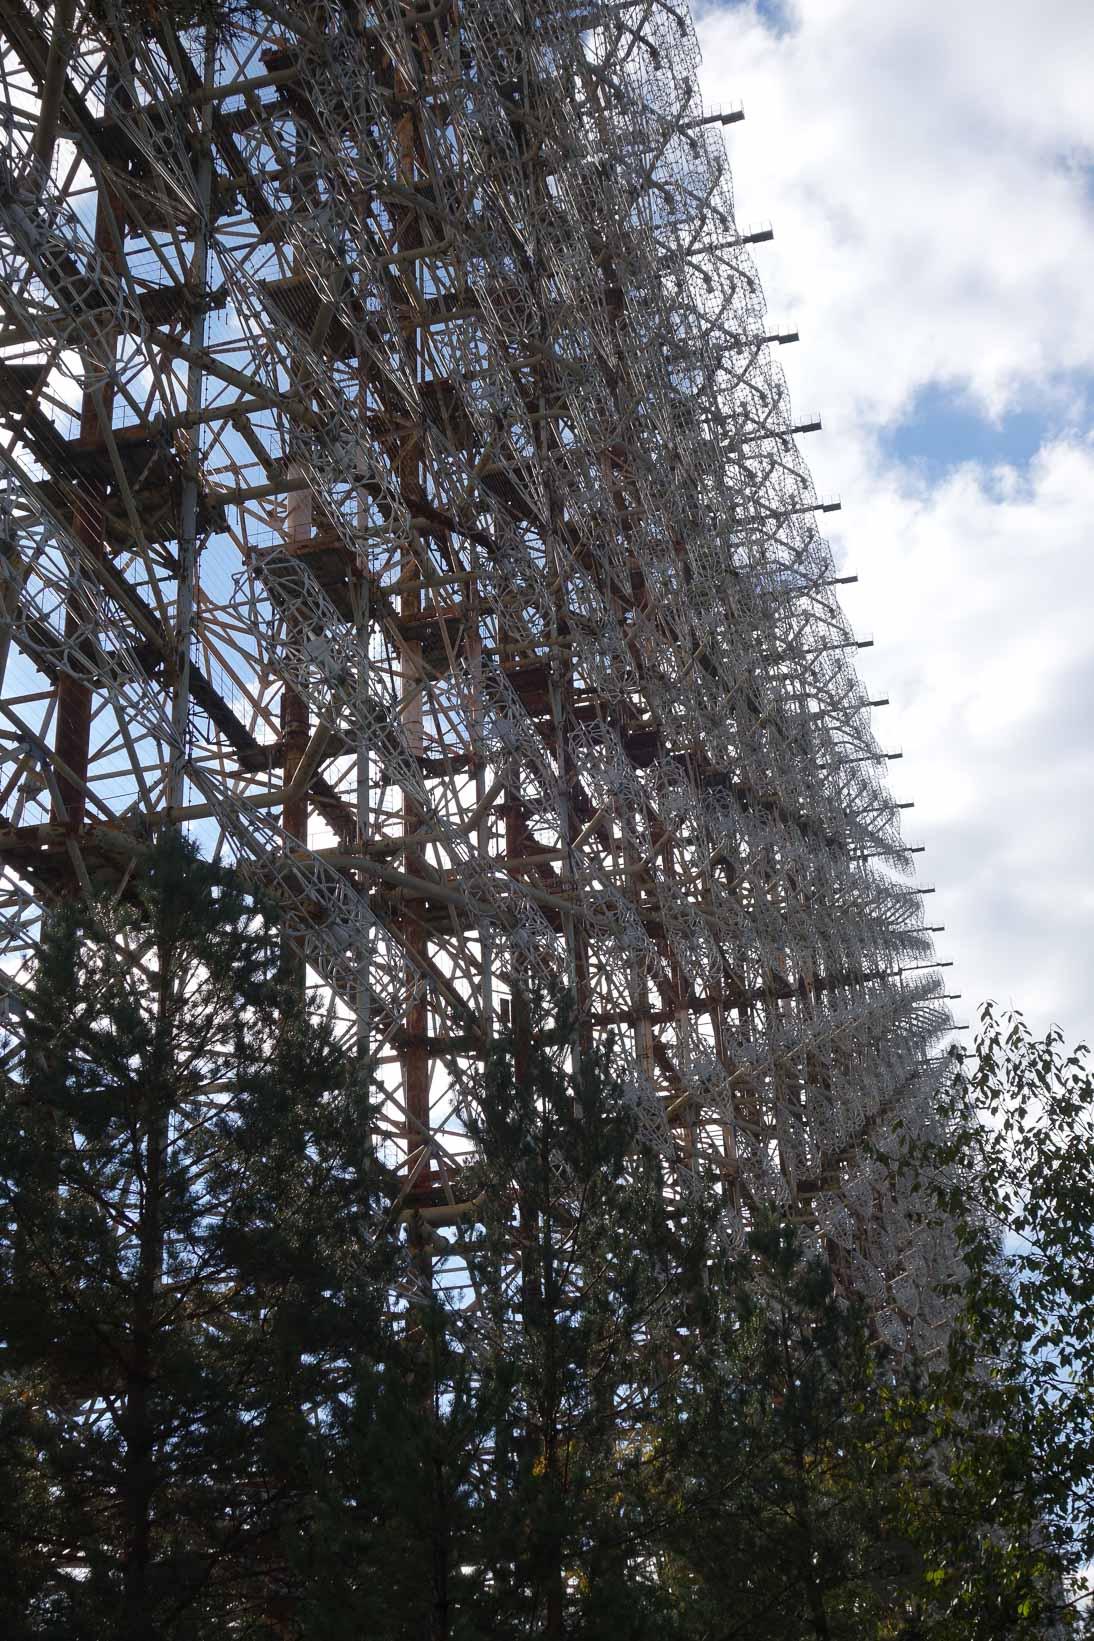 Raketenspähsystem Duga 1 (auch Tschernobyl-2 genannt) 150 Meter hoch und 750 Meter ln lang